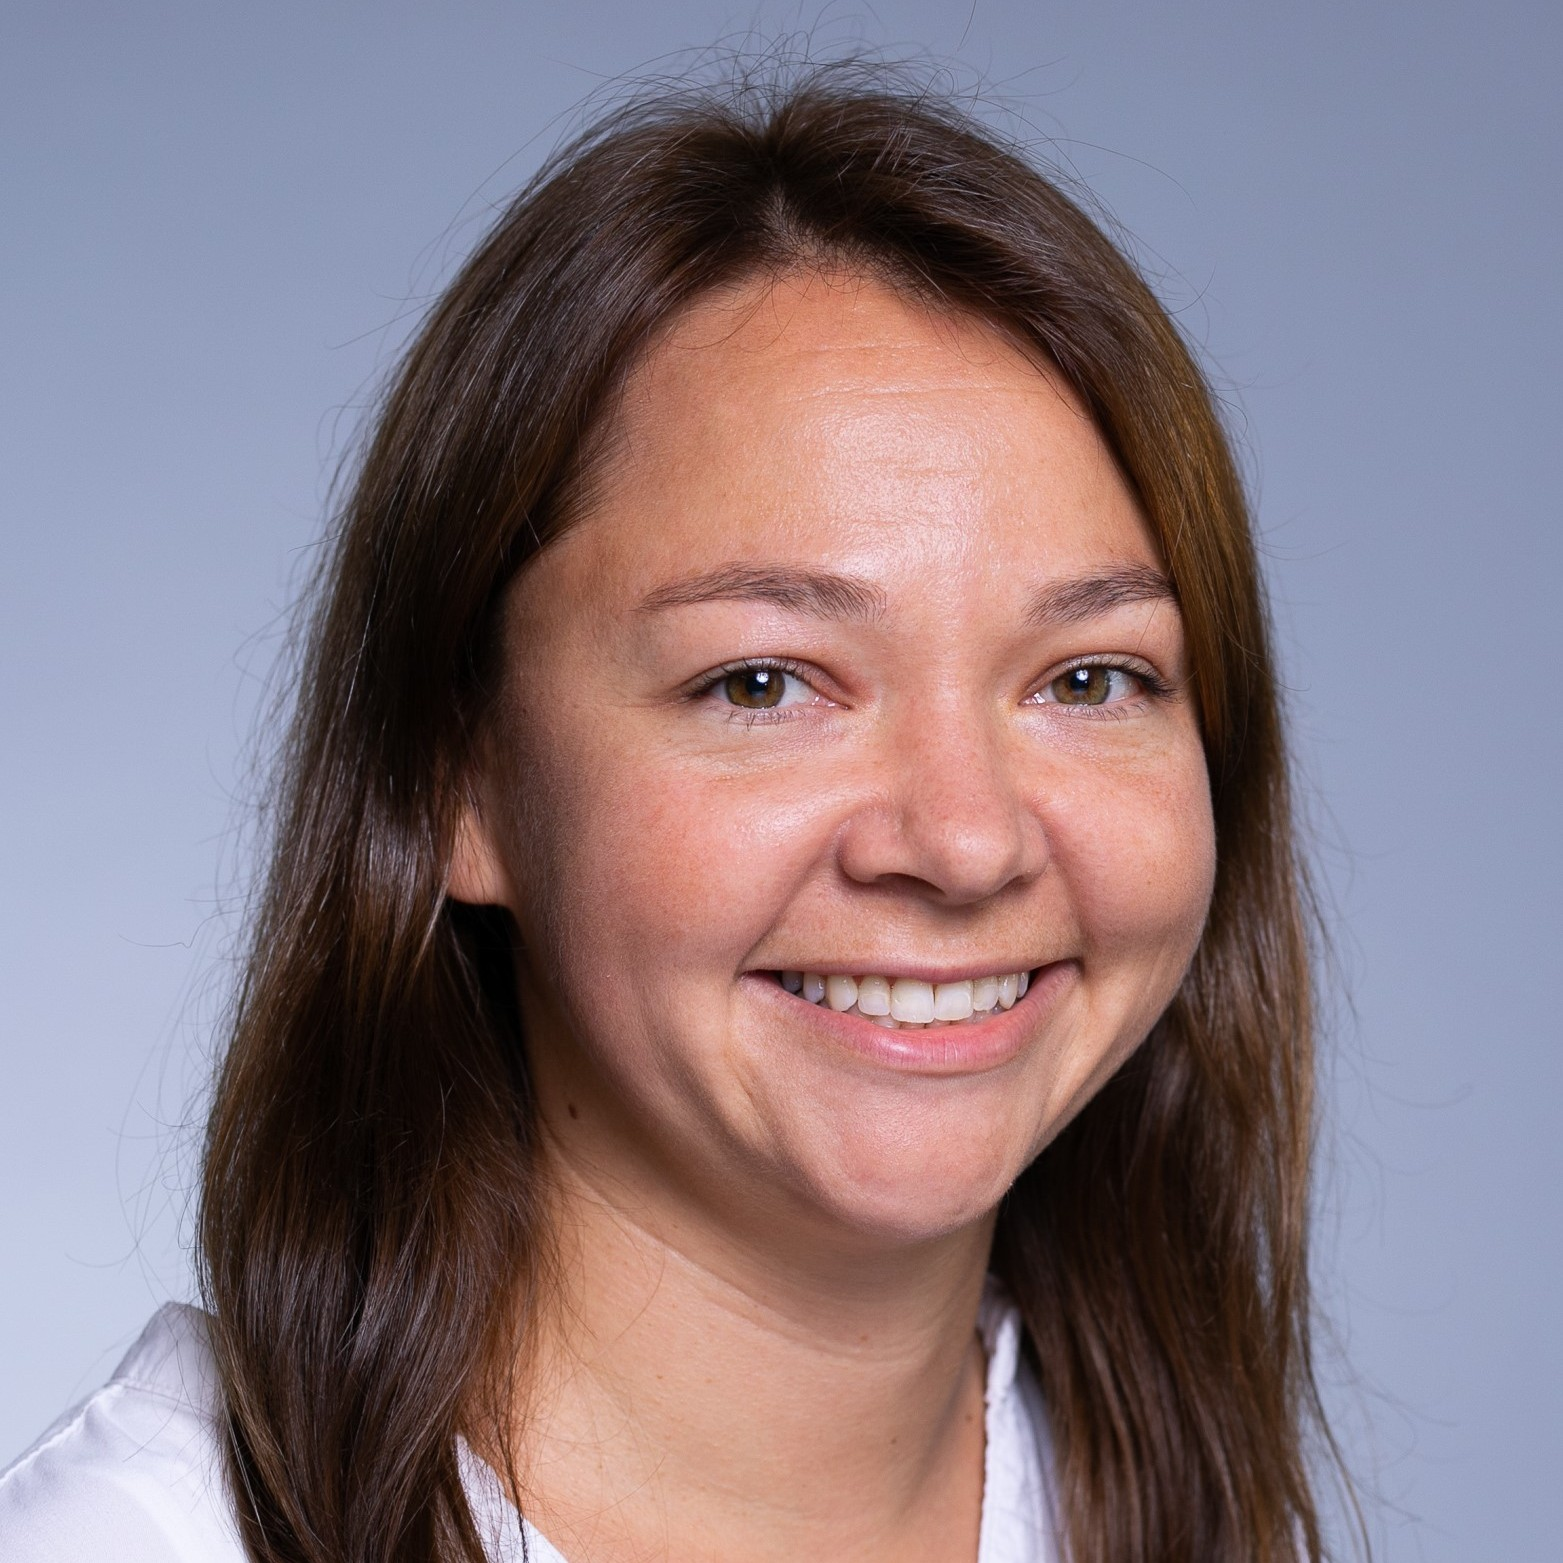 Daniela Schremser